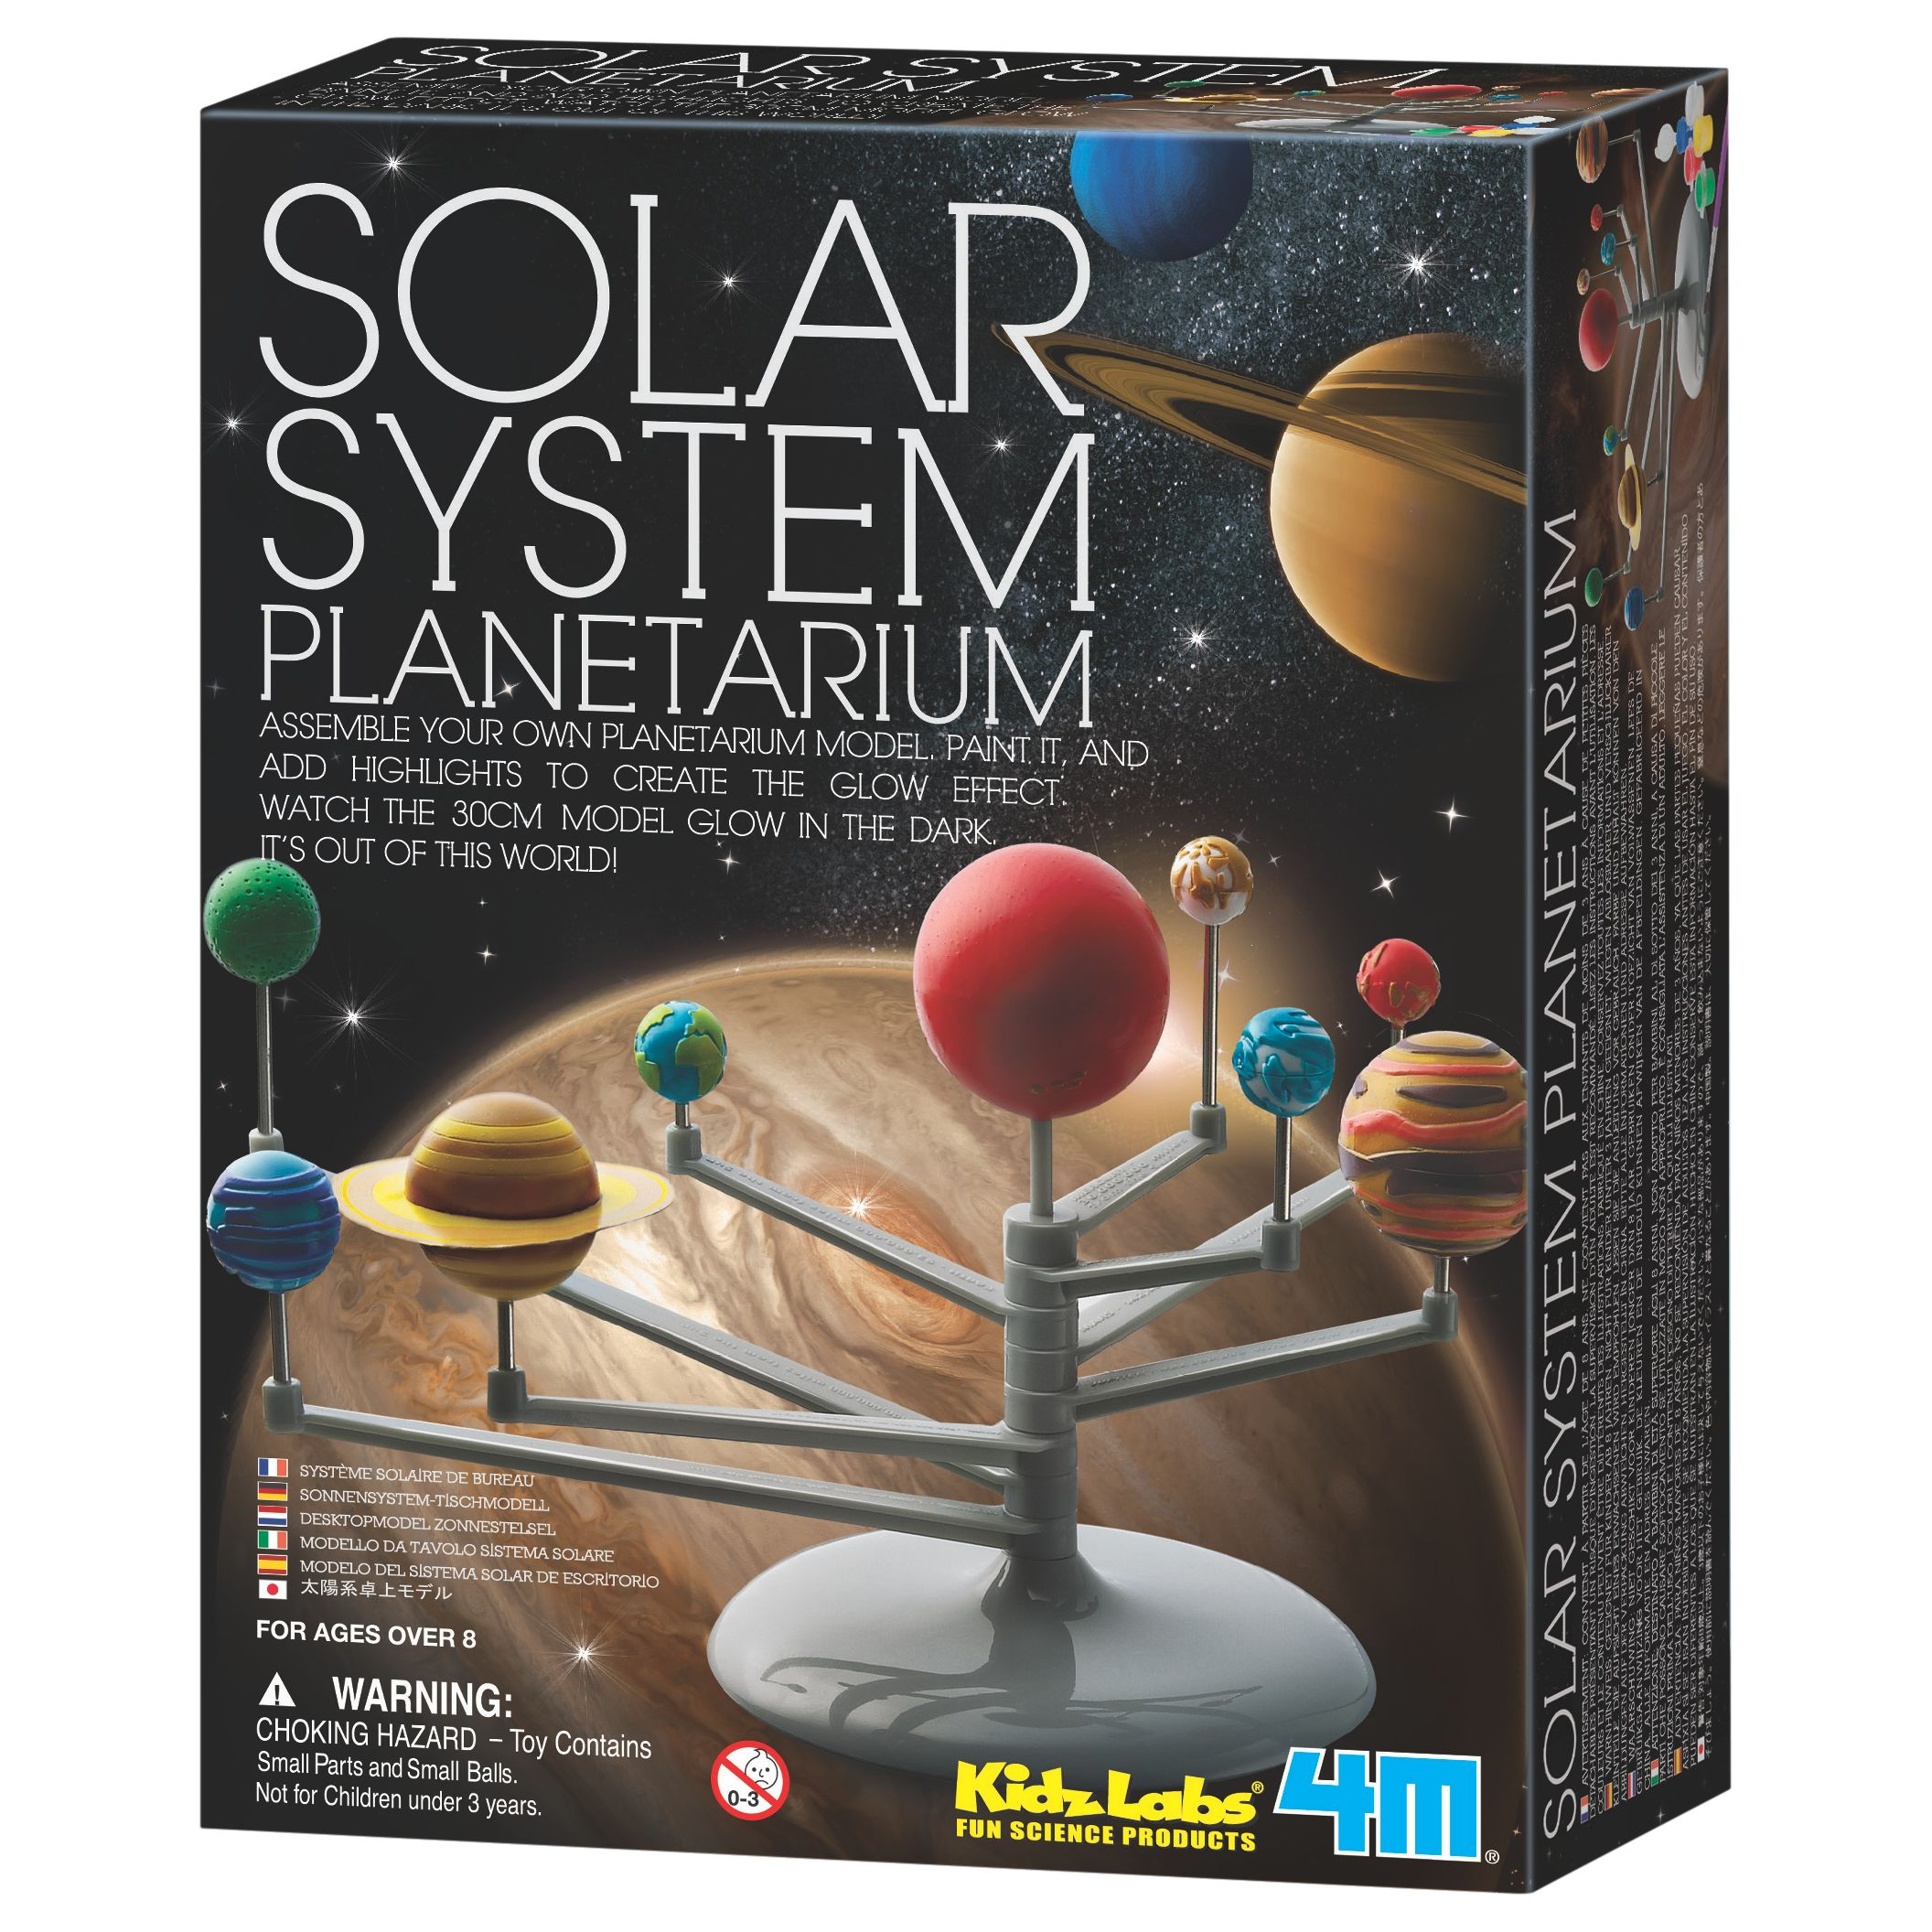 Great Gizmos Kidz Labz Solar System Planetarium